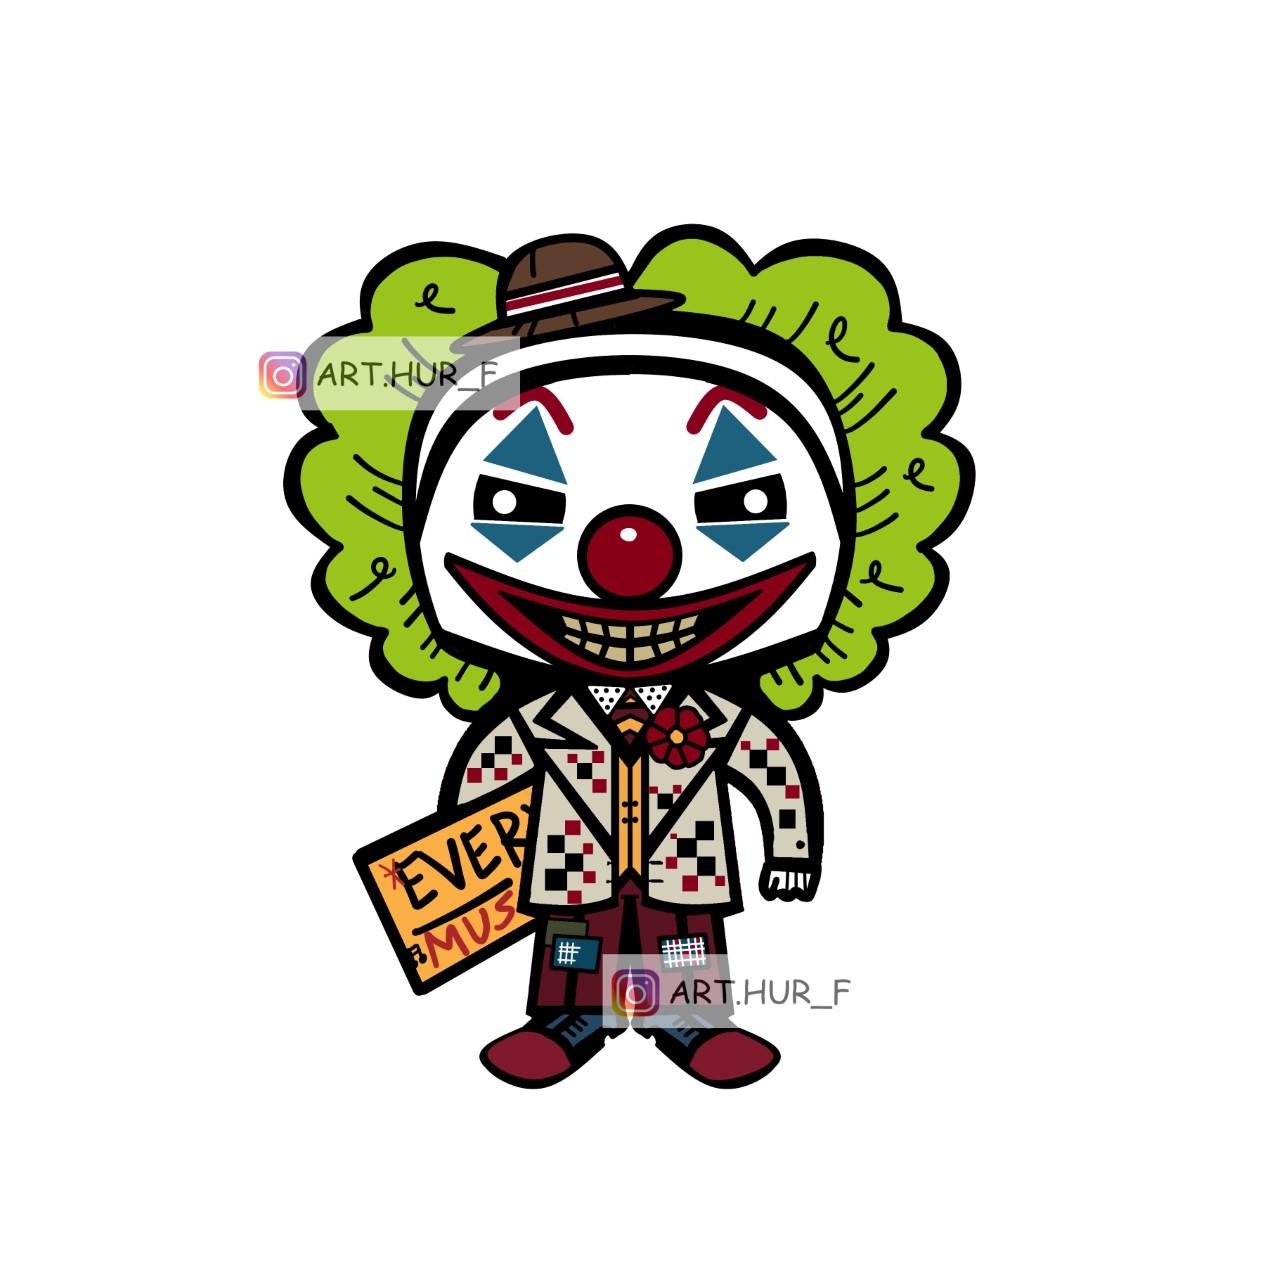 sticker arthur fleck en clown joker arthur fouchet boutique esprit Pop shop